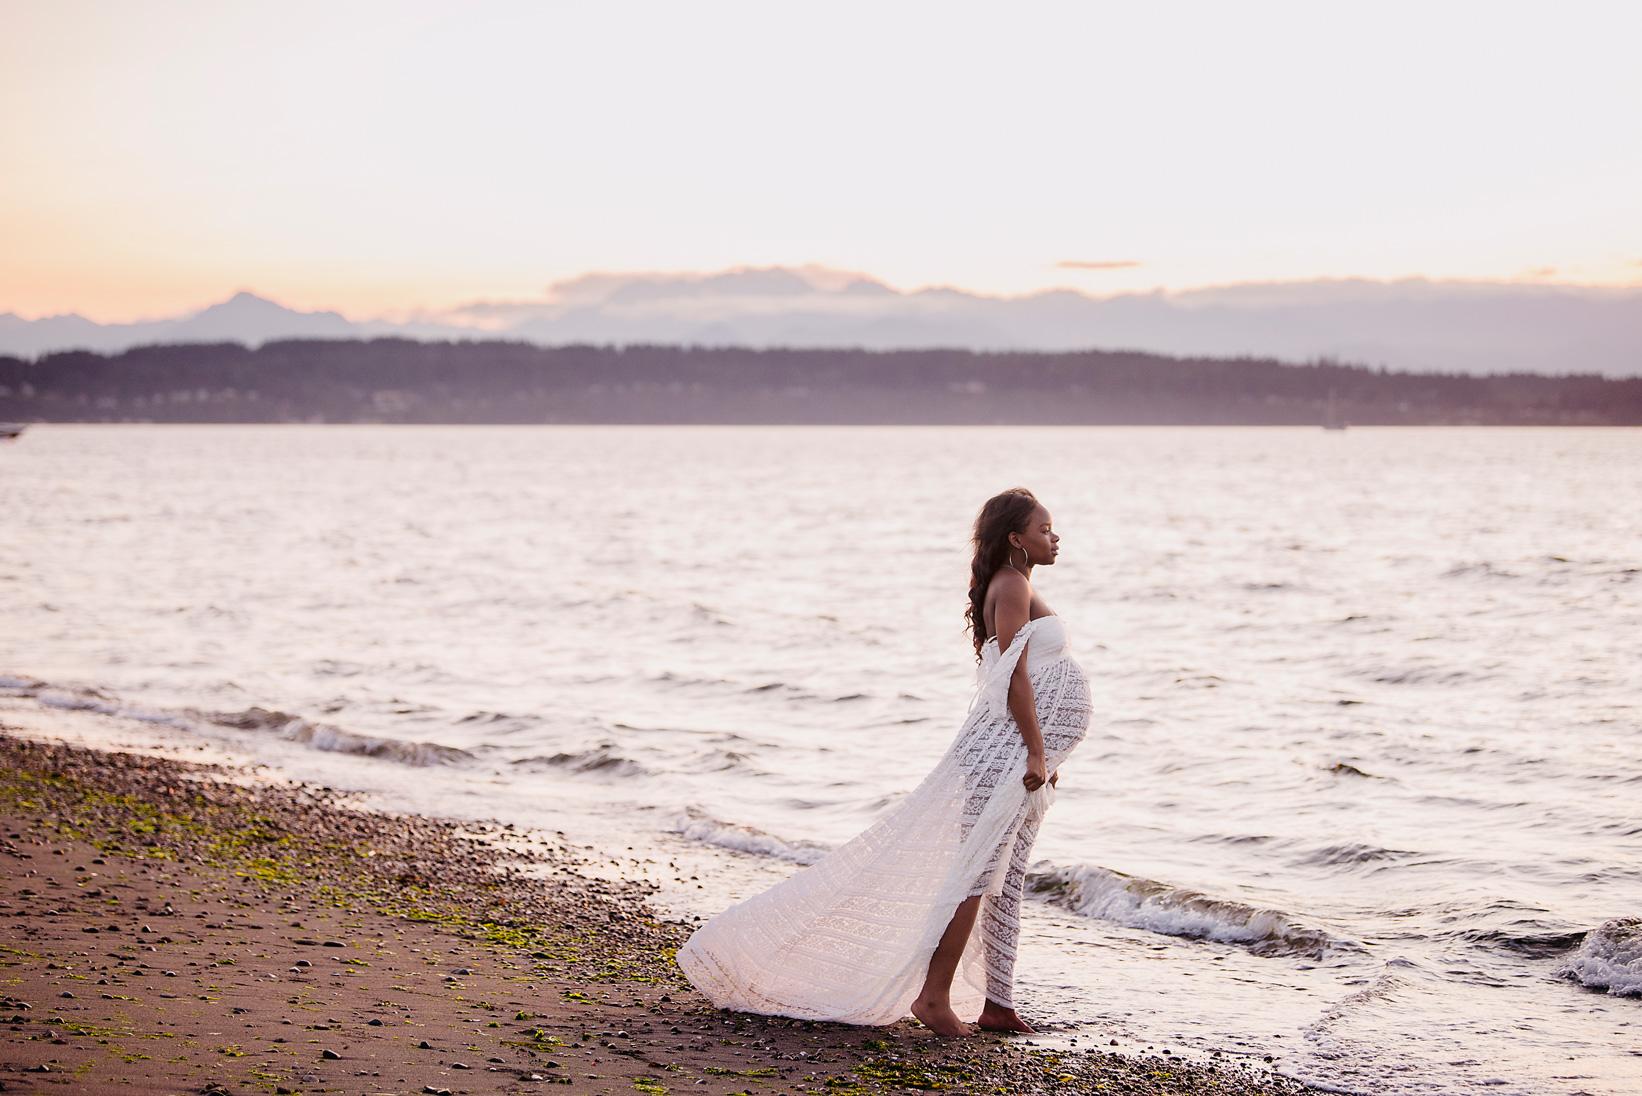 Dallas Maternity Photographer, Babymoon Photographer, Travel Photographer, Destination Photographer, Luxury Maternity Photographer, NYC Maternity Photographer, Seattle Maternity Photographer, Beach Maternity Photographer